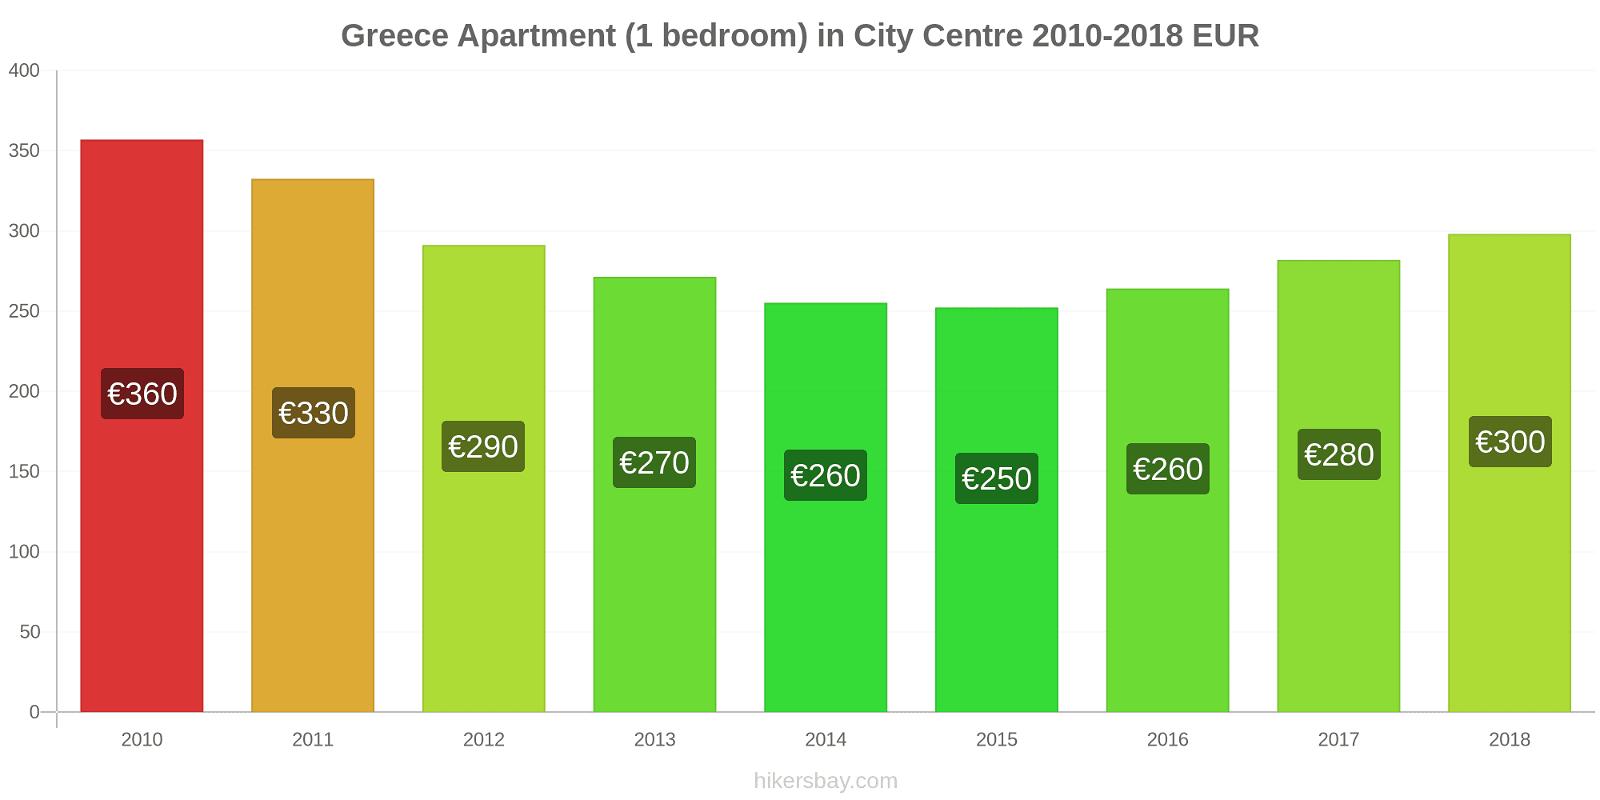 Greece price changes Apartment (1 bedroom) in City Centre hikersbay.com